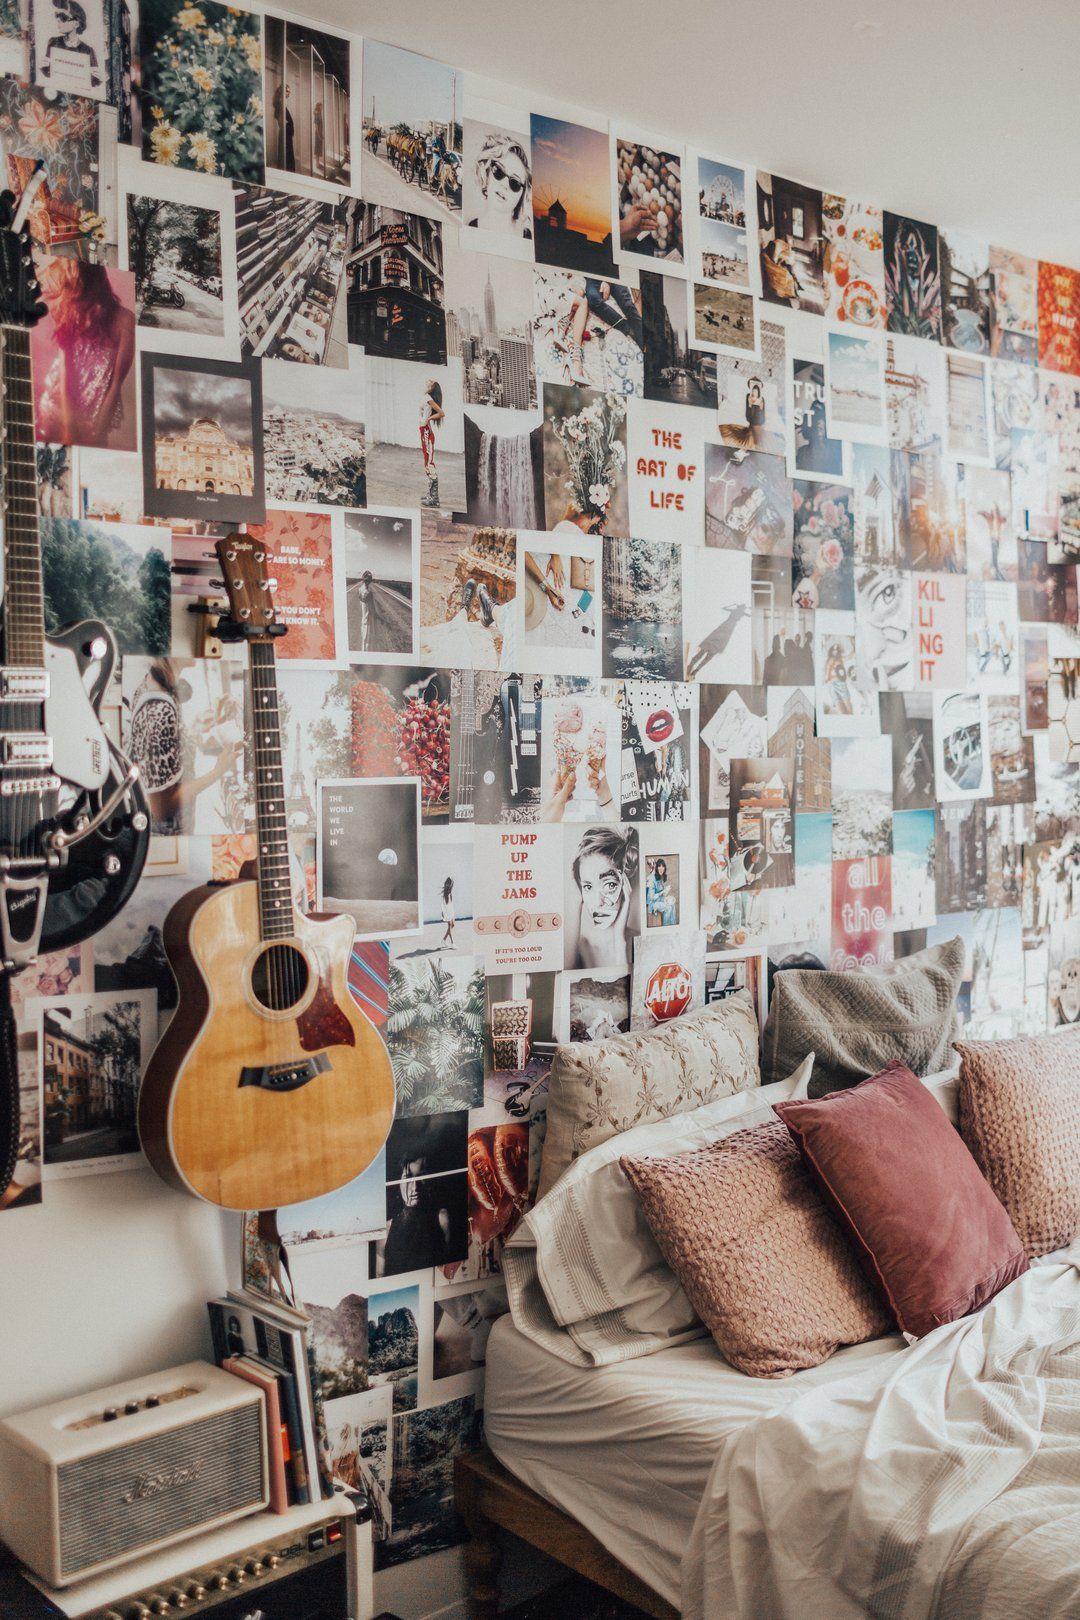 Tezza Collage Kit Room Inspiration Decor Dorm Organization